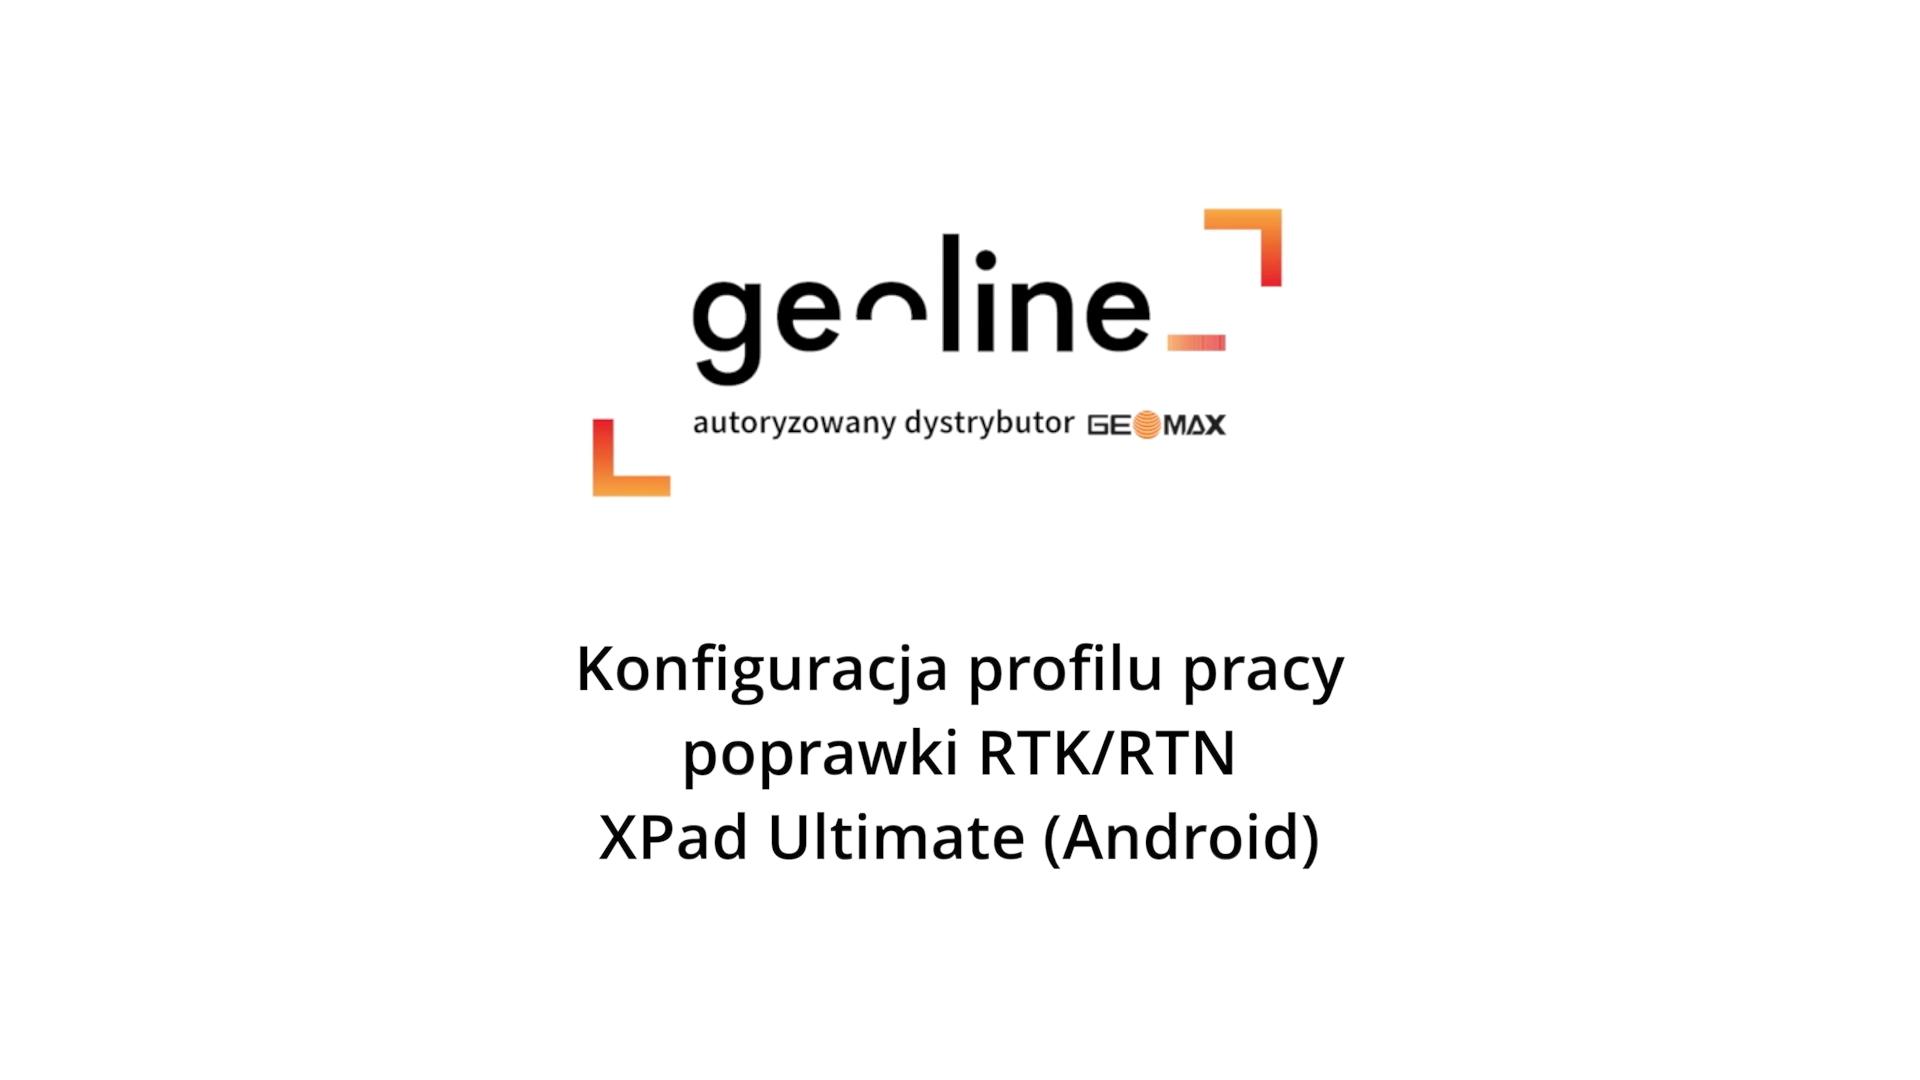 Konfiguracja profilu pracy – poprawki RTK/RTN XPad Ultimate (Android)